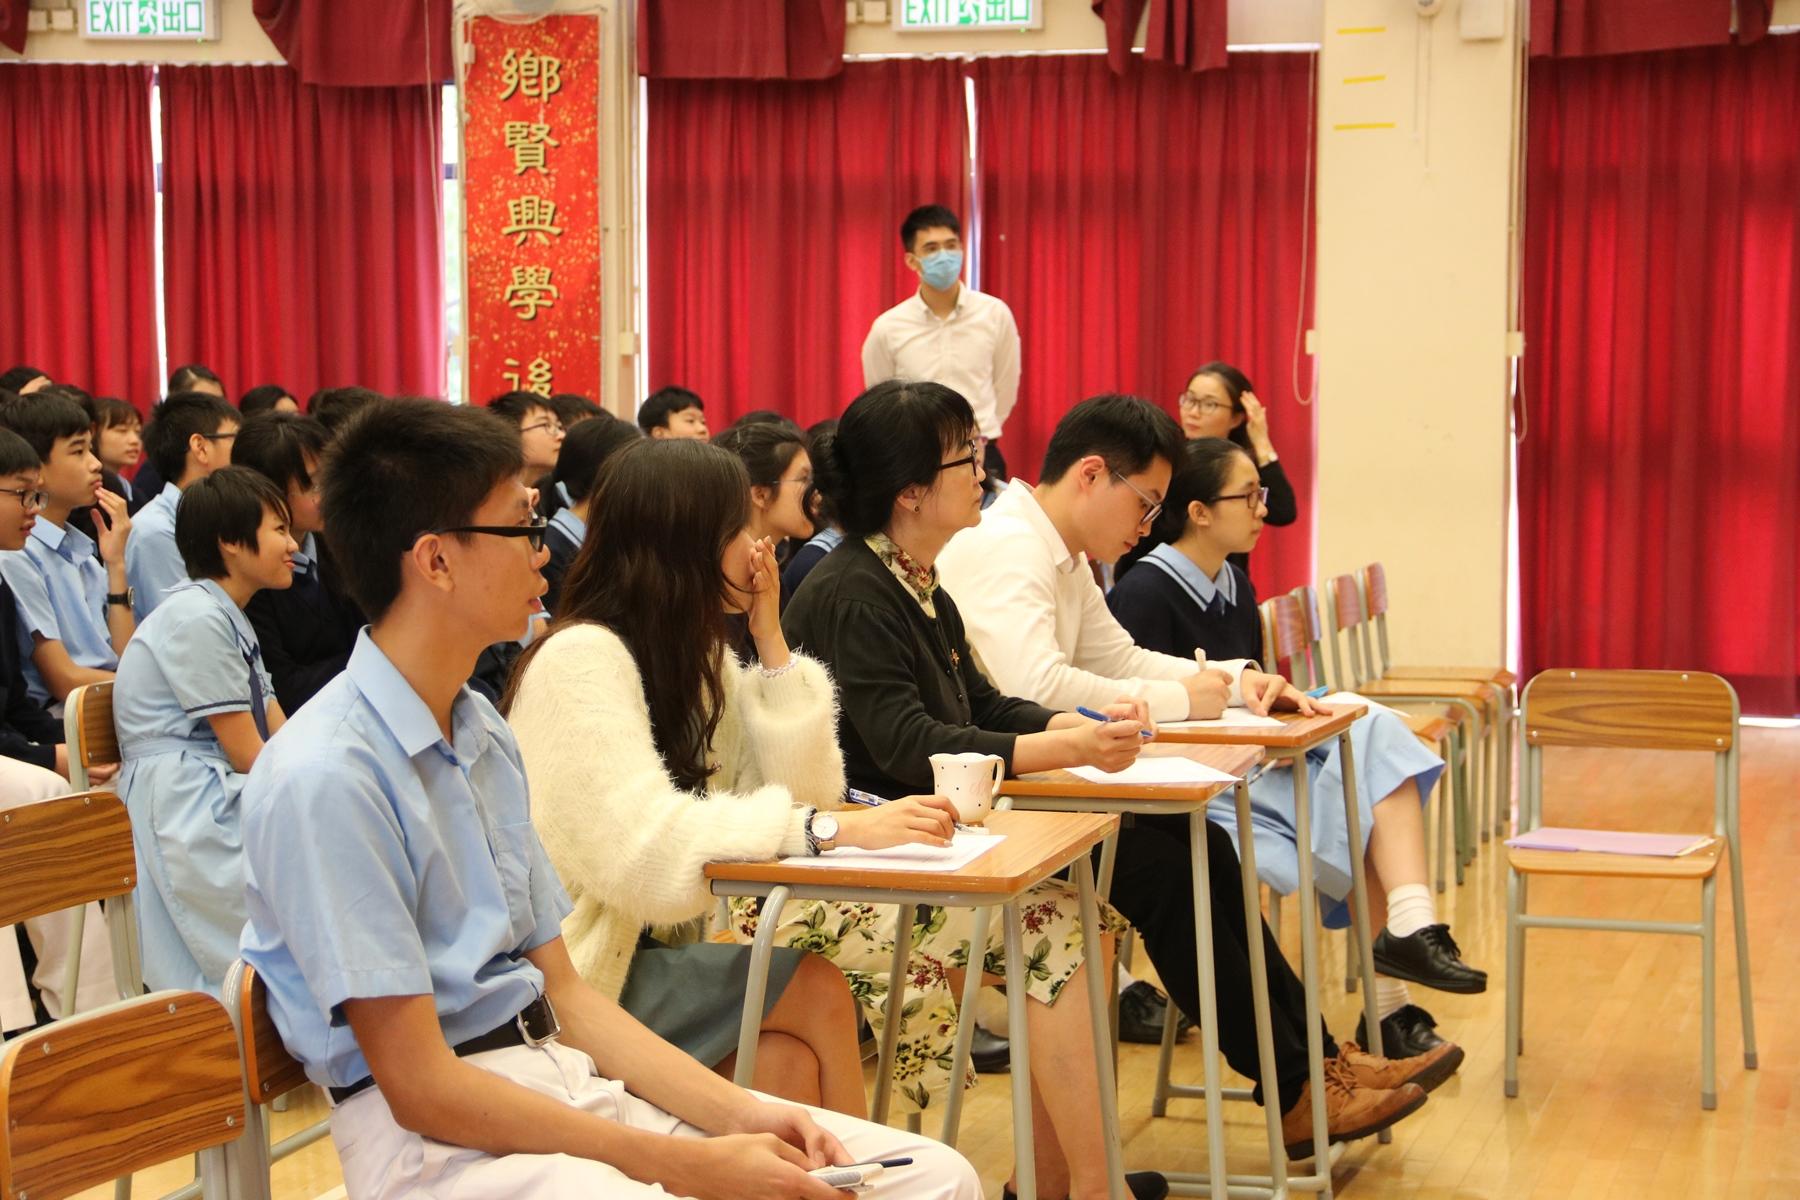 http://npc.edu.hk/sites/default/files/img_3973.jpg